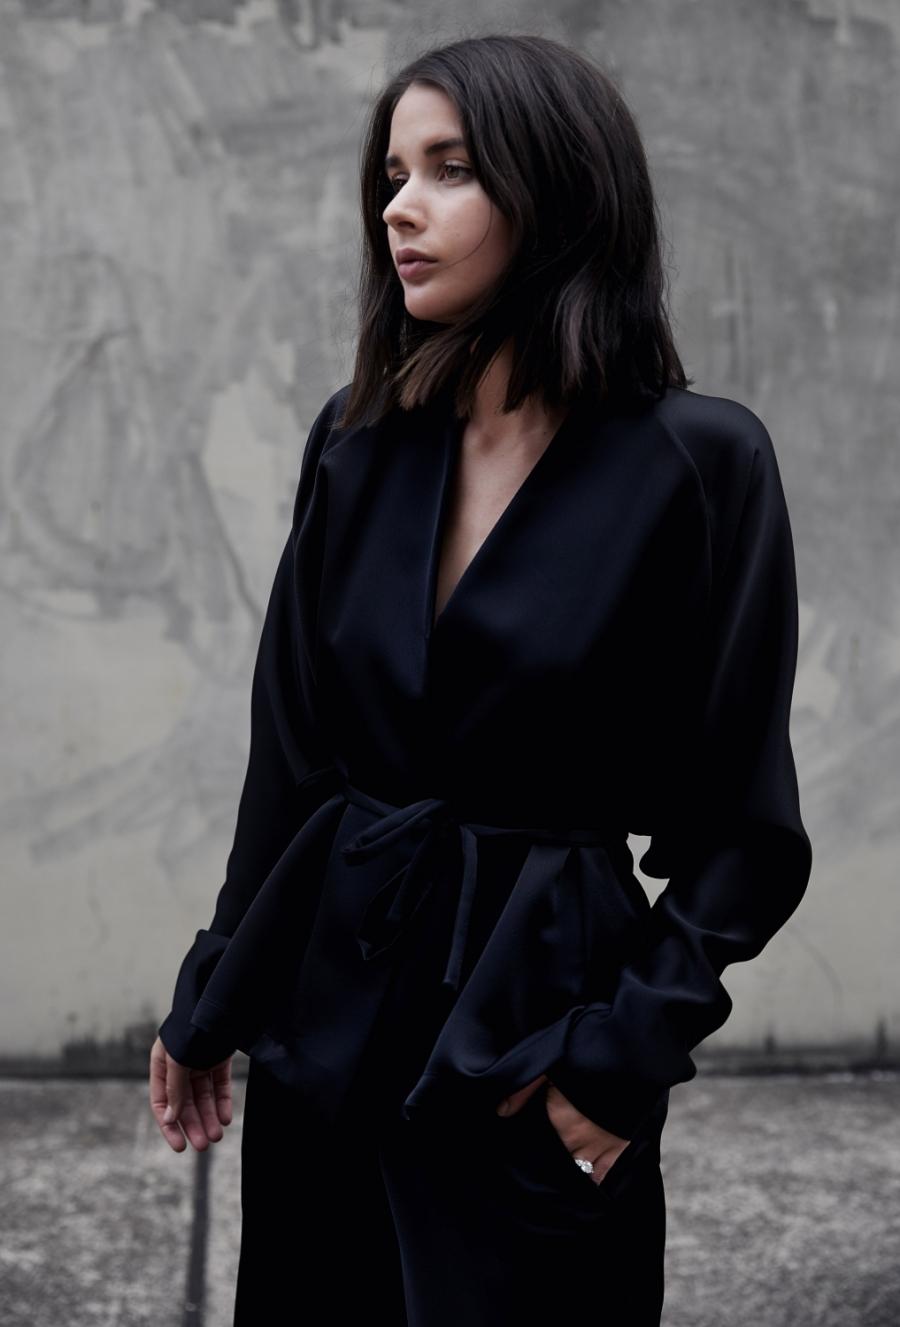 Steal Her Style: Elegant Pyjama Look | Love Daily Dose